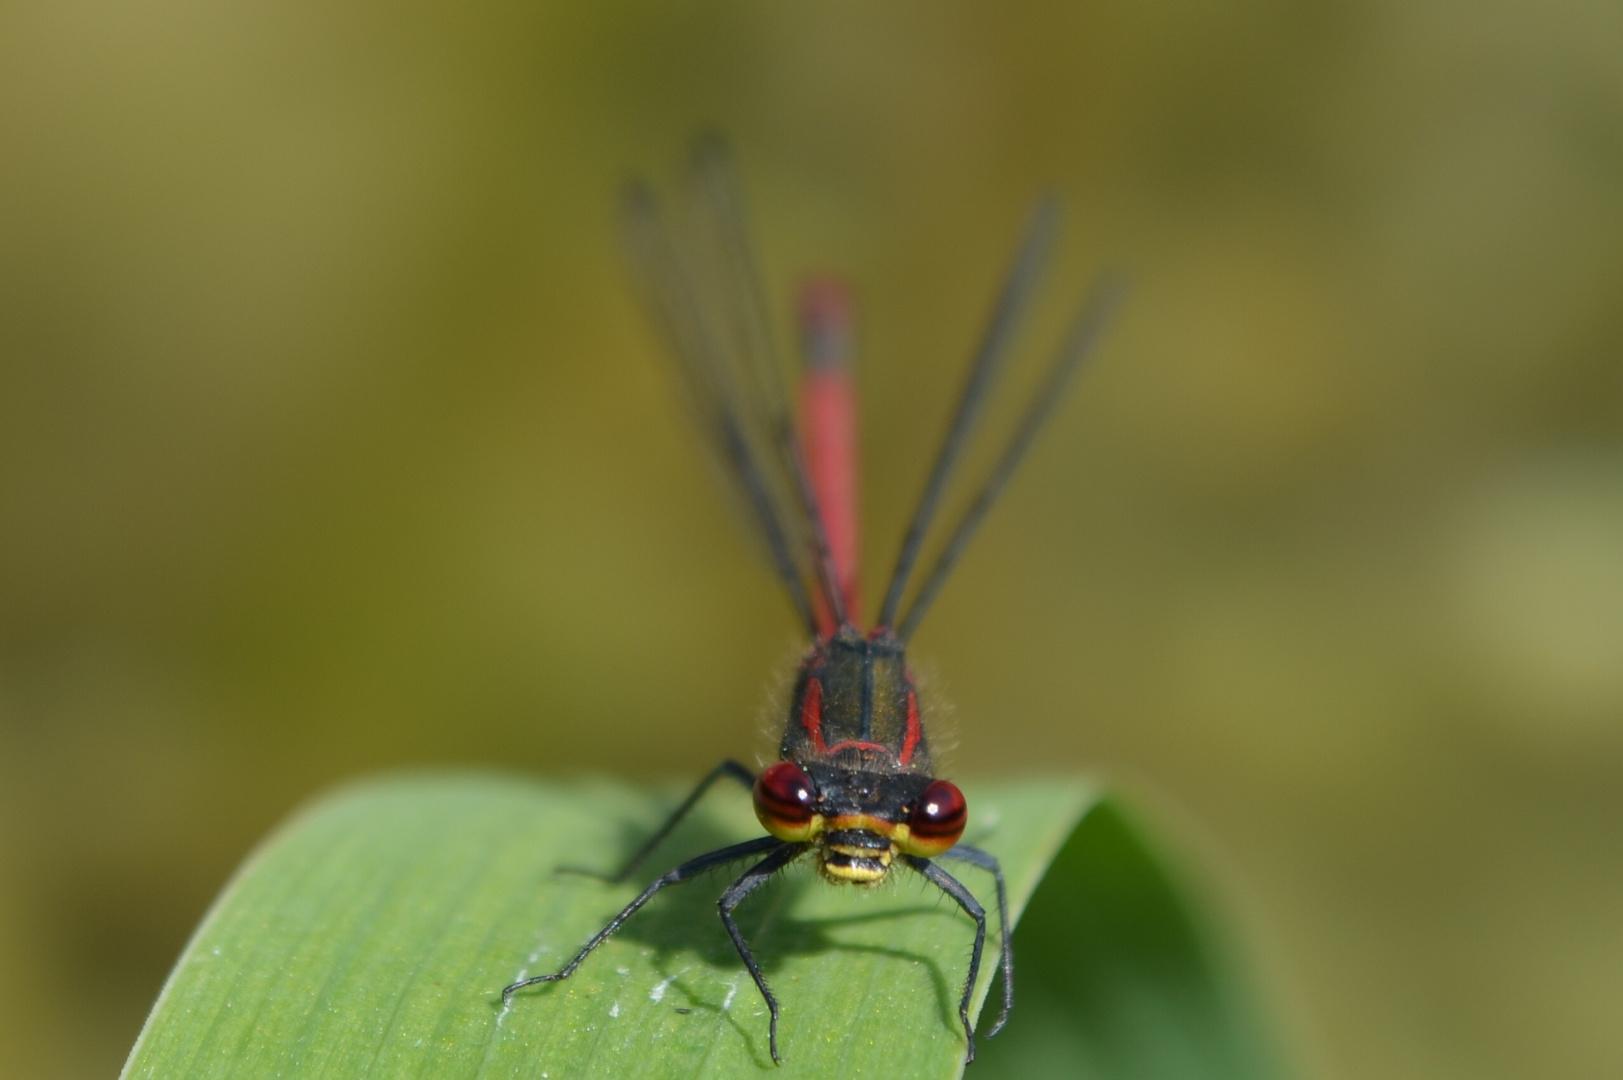 Libelle am Schwimmteich